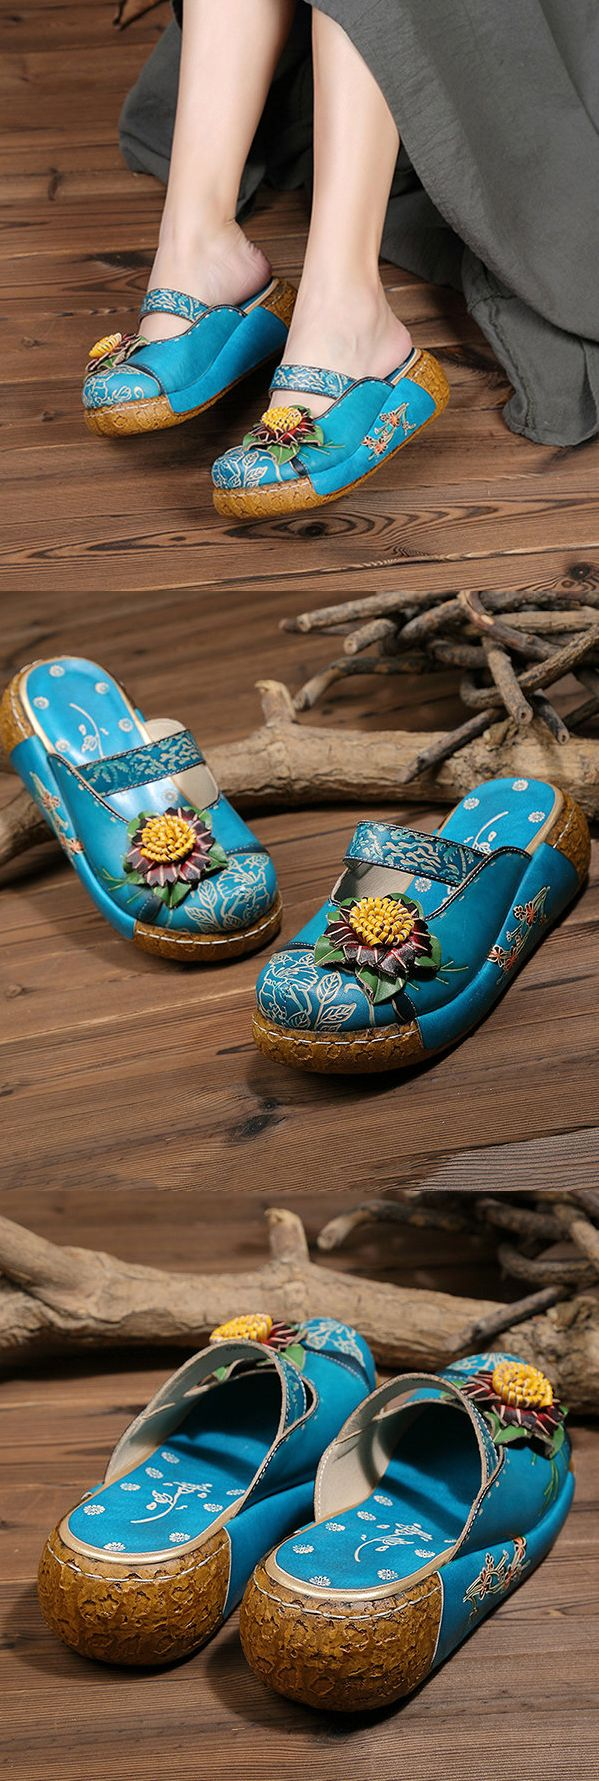 US$48.00 SOCOFY Handmade Flower Folkways Vintage Sandals